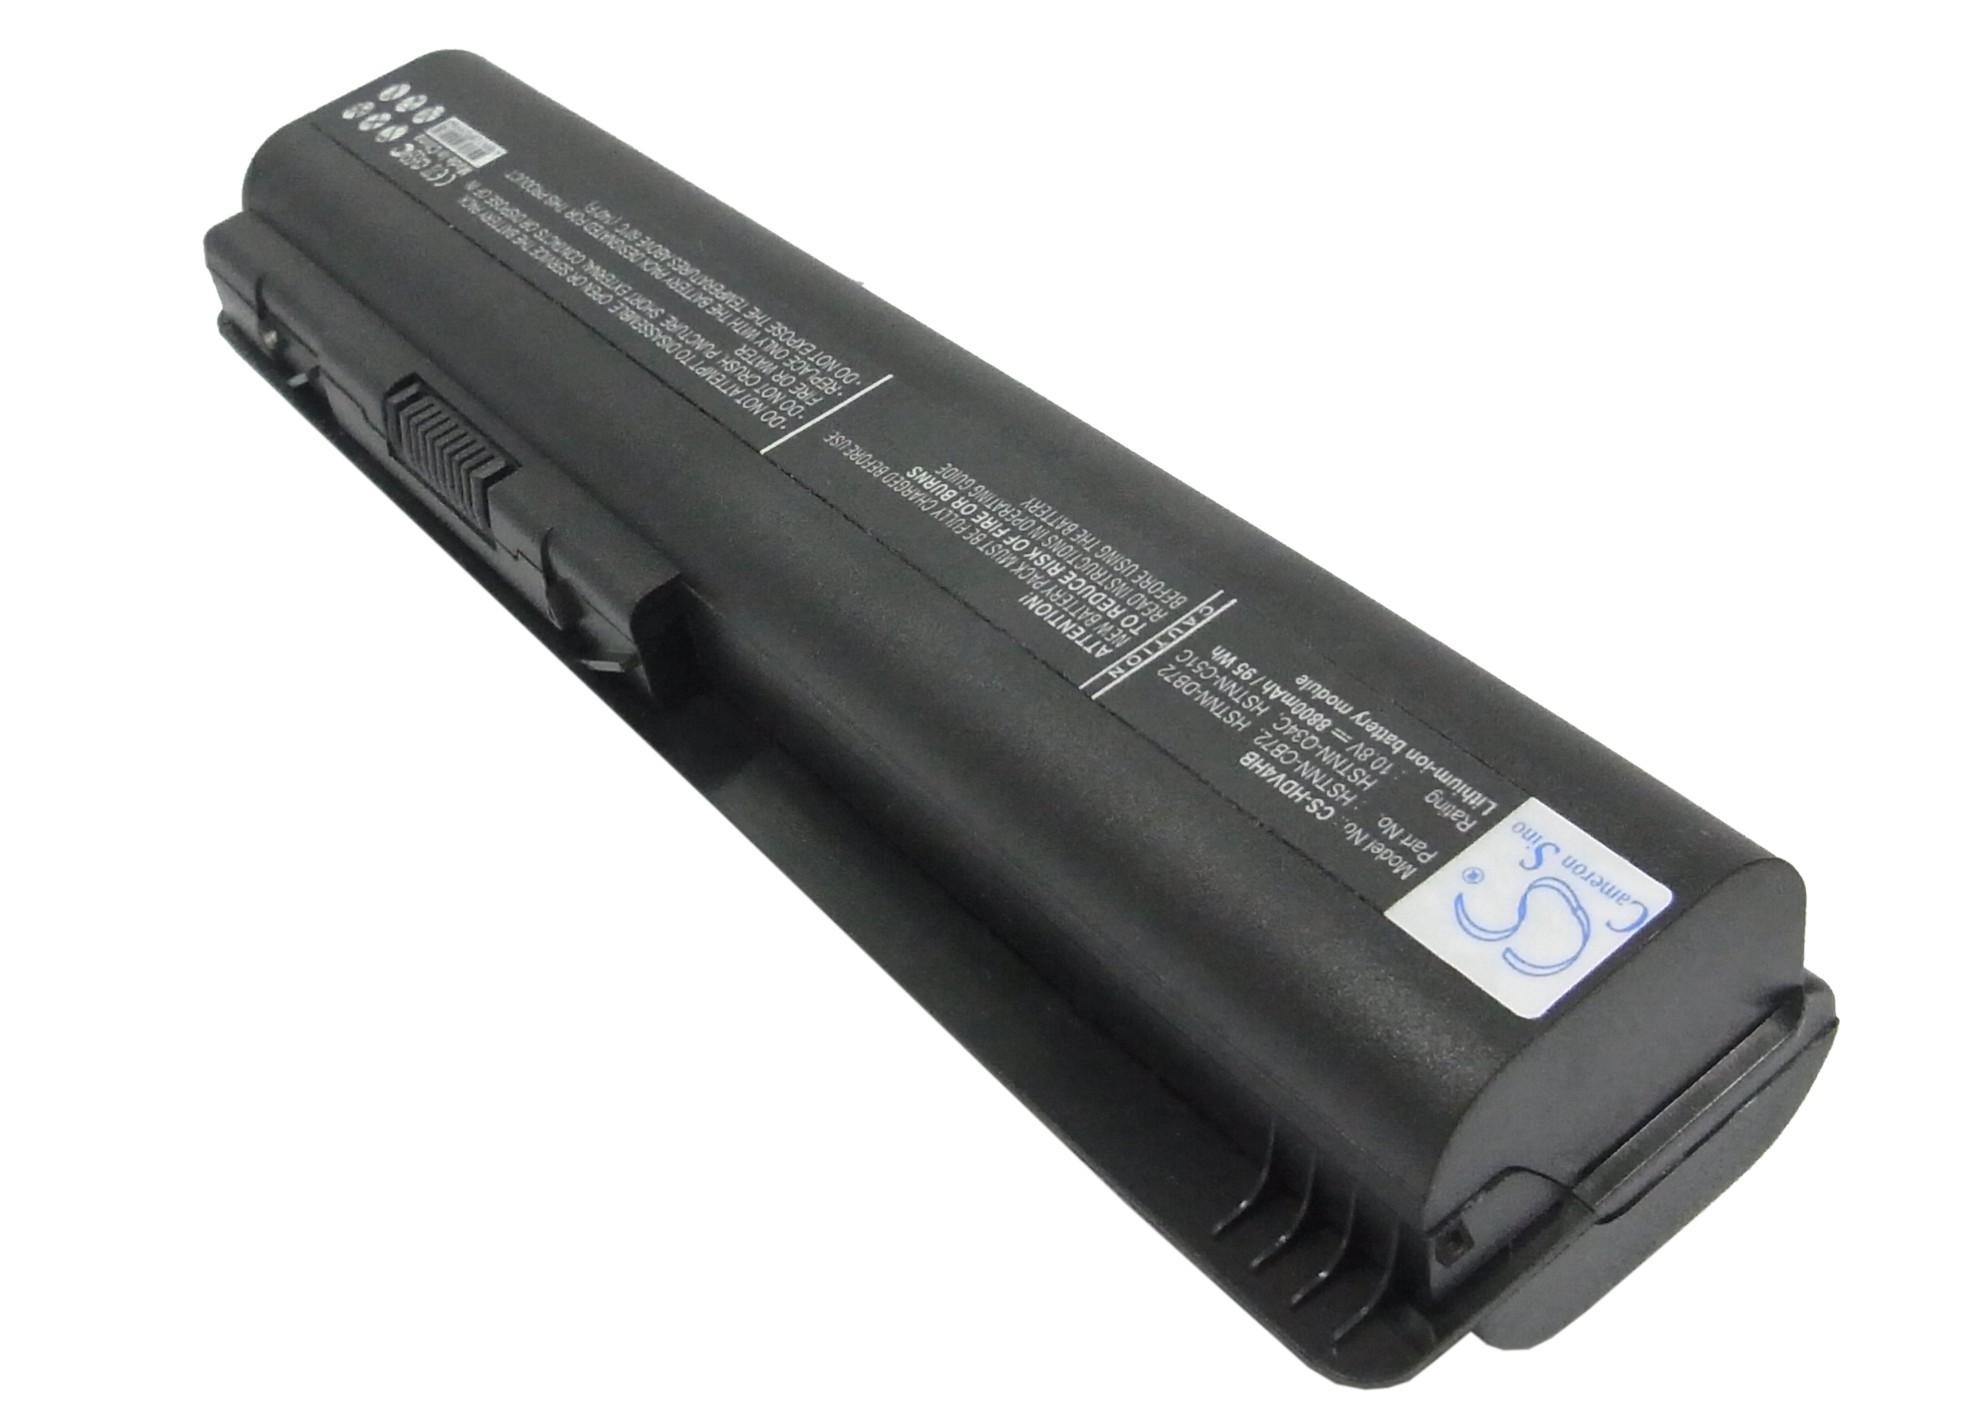 Cameron Sino baterie do notebooků pro COMPAQ Presario CQ60-300 10.8V Li-ion 8800mAh černá - neoriginální